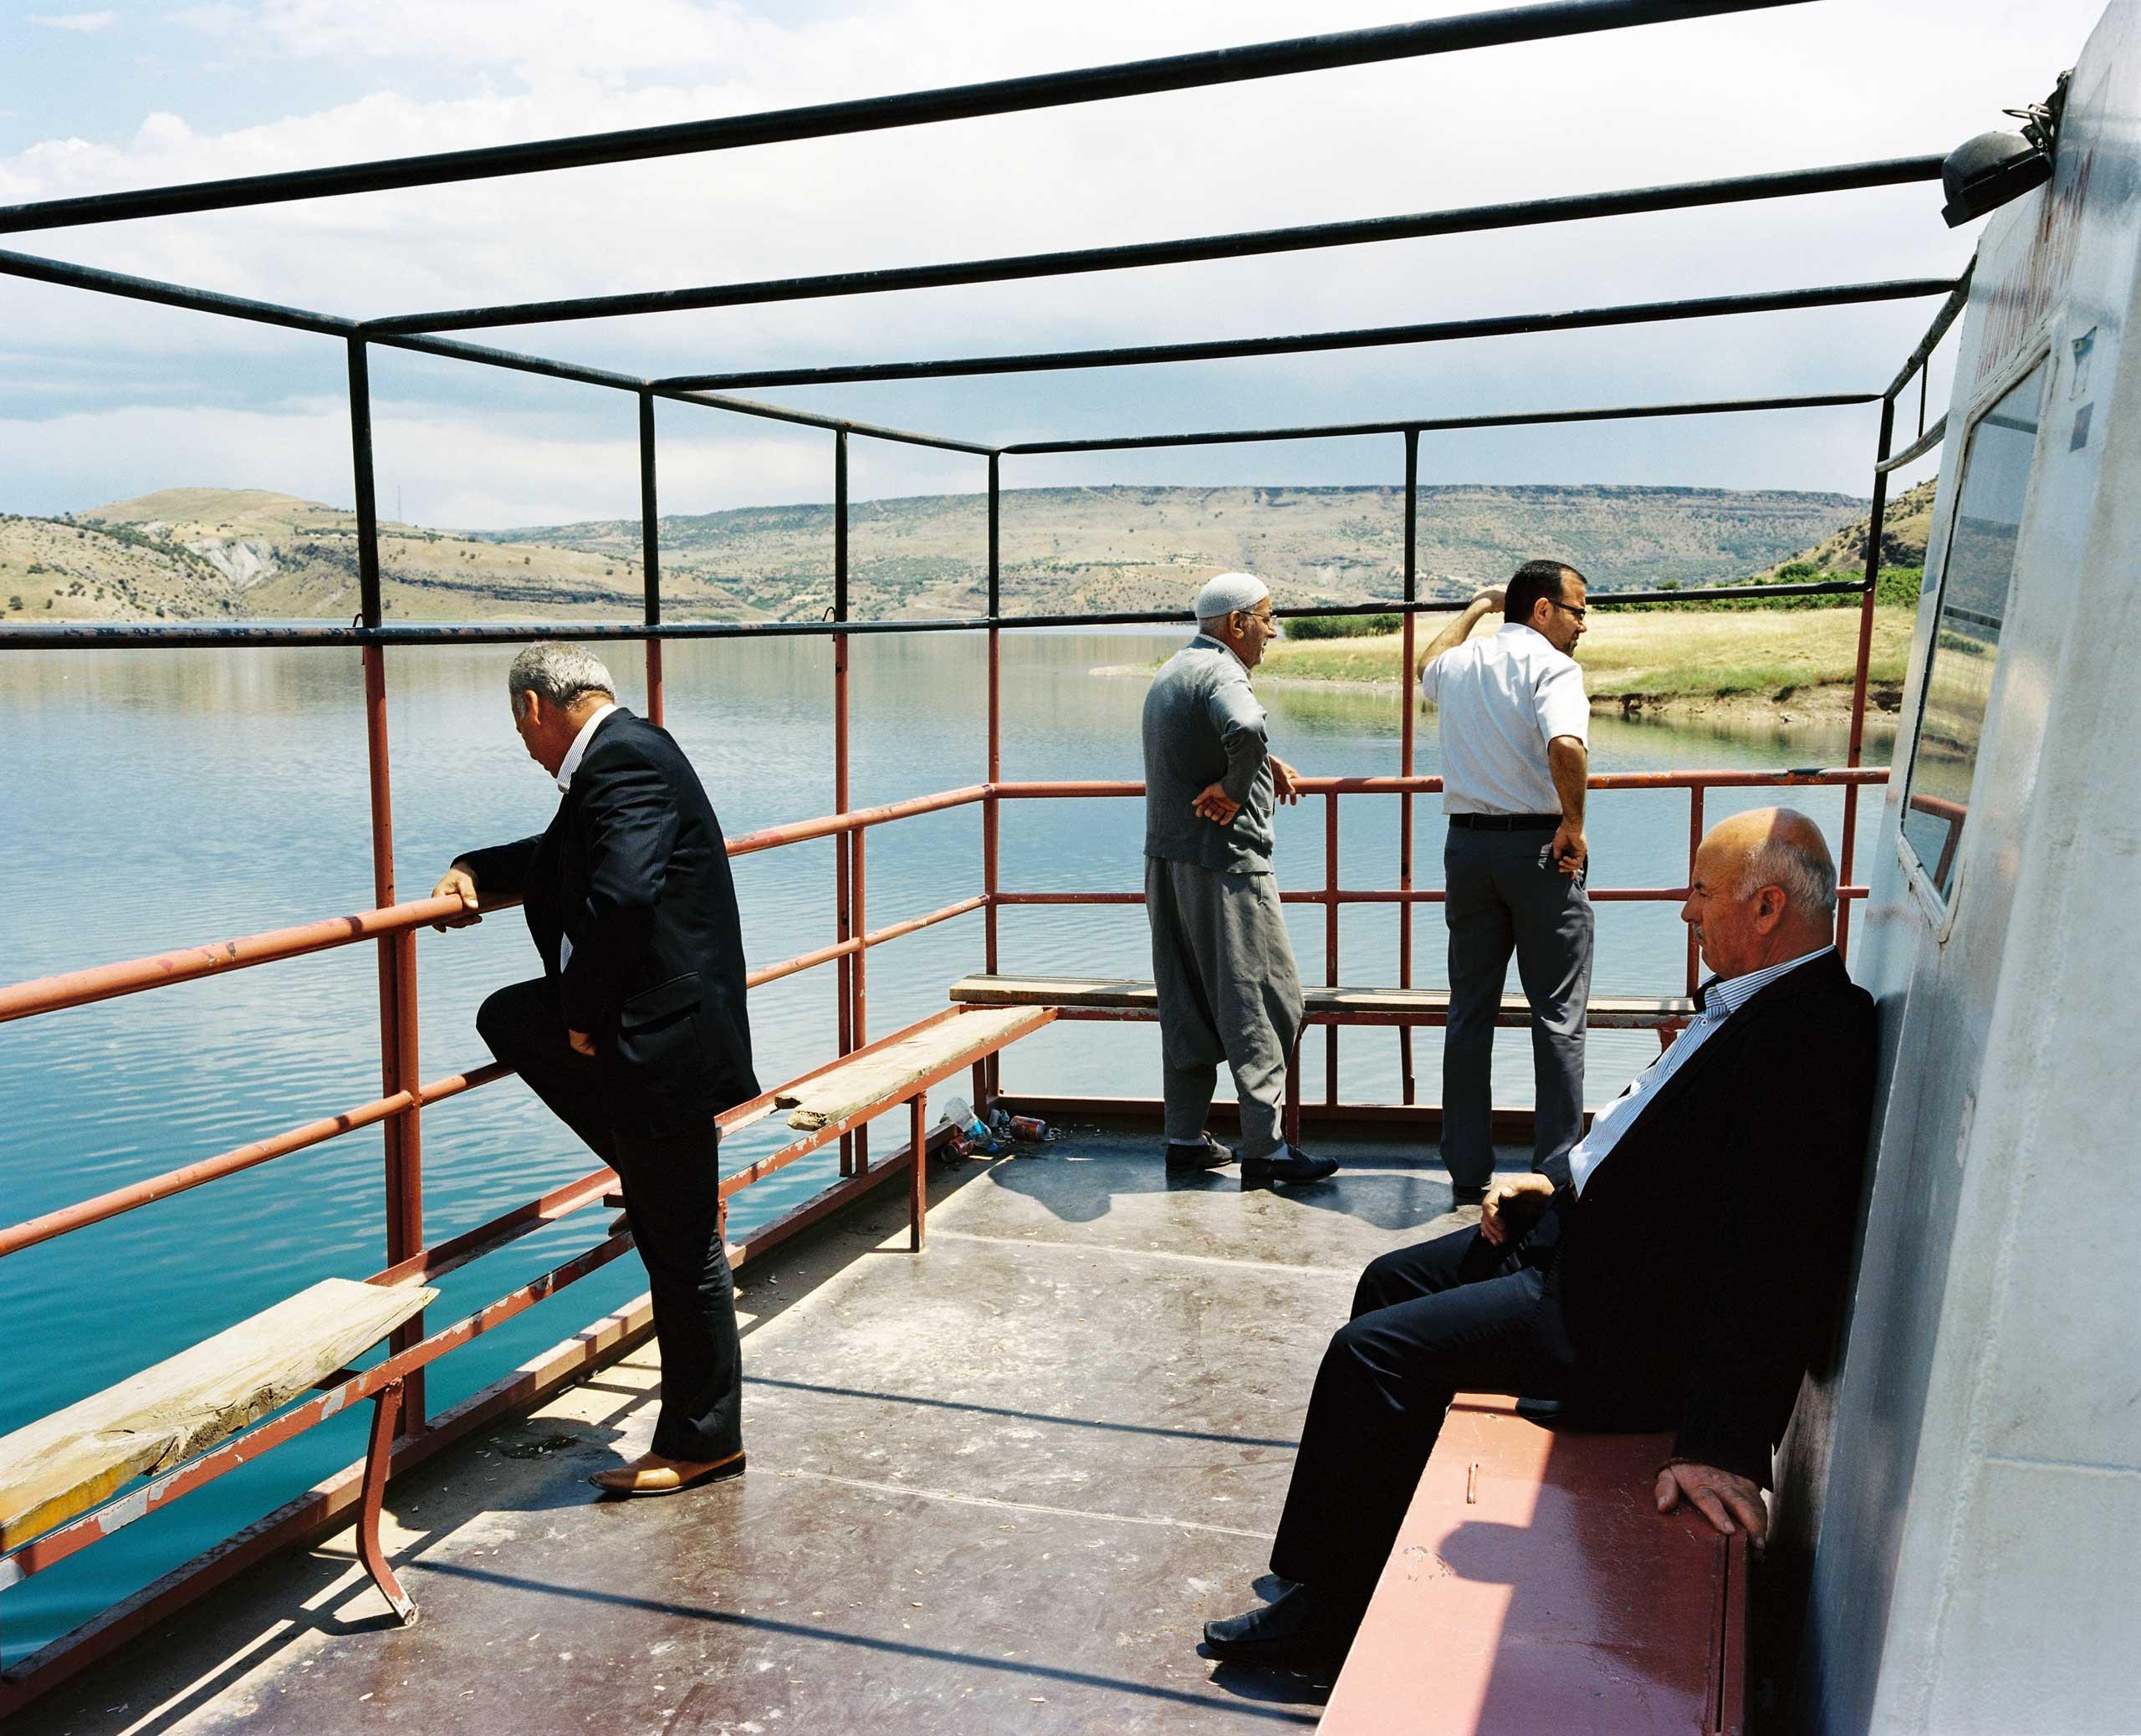 Men on a ferry boat travel across the Euphrates River near the Keban Dam. Keban, Turkey.